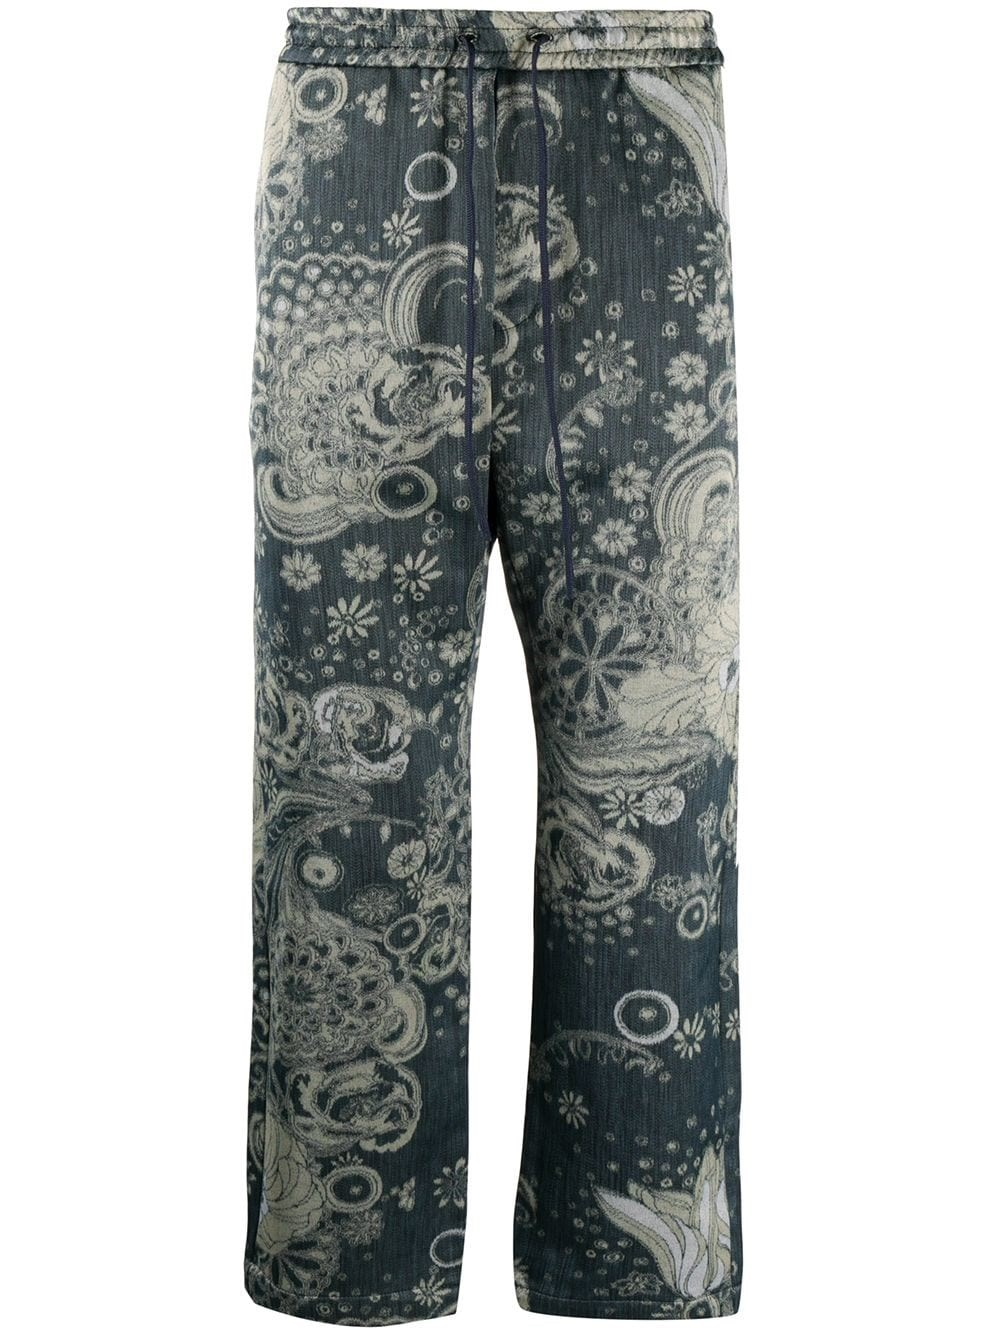 BARENA VENEZIA Paisley Print Trousers